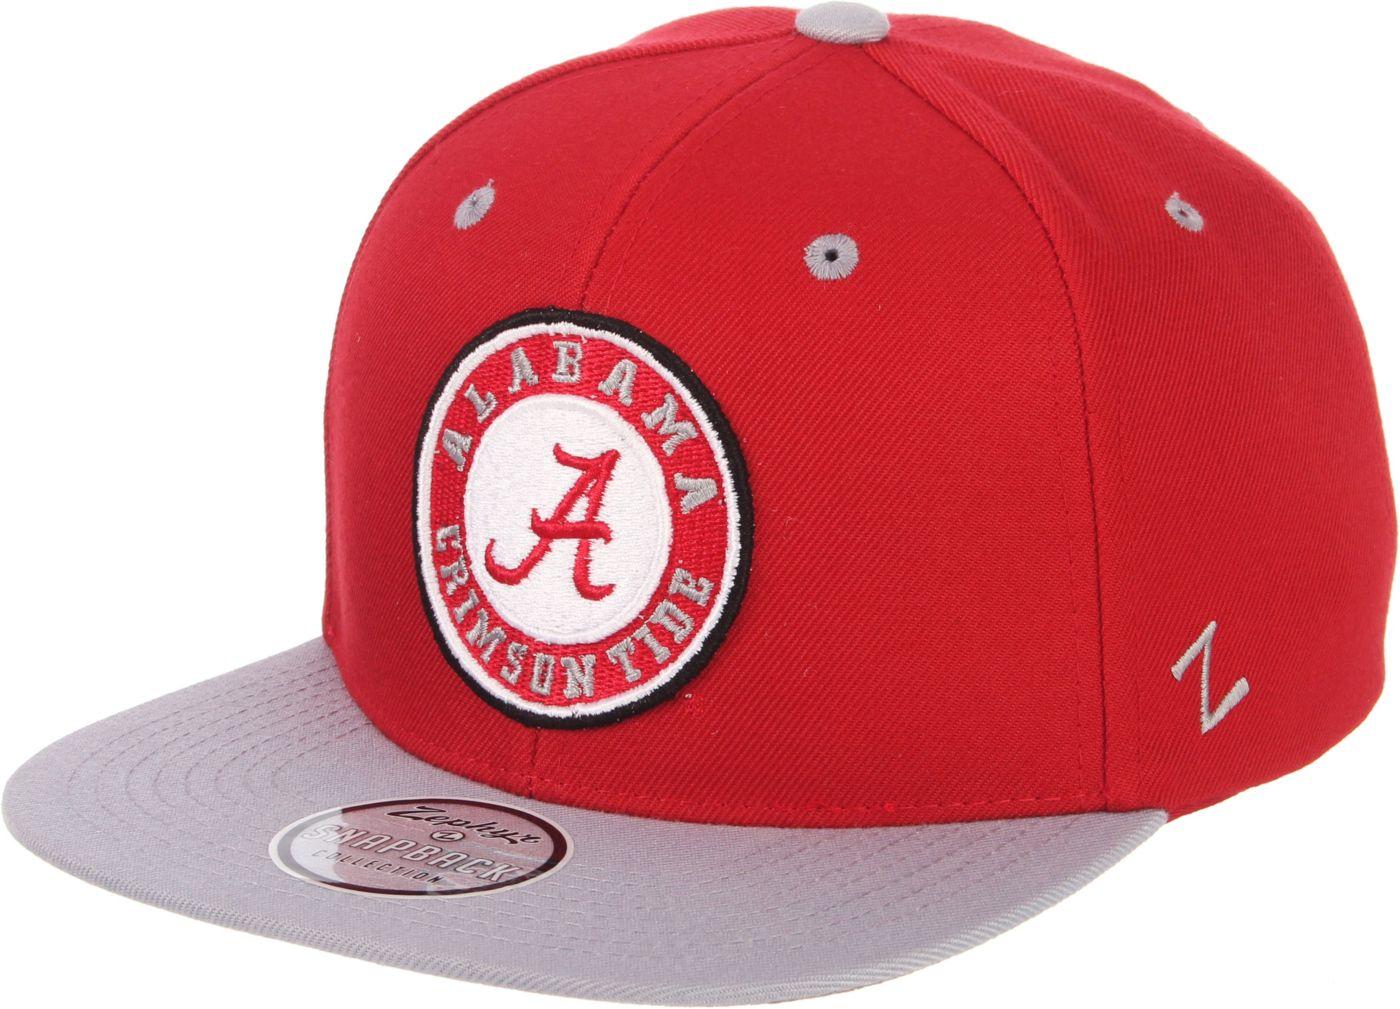 Zephyr Men's Alabama Crimson Tide Crimson/Grey Script Adjustable Snapback Hat